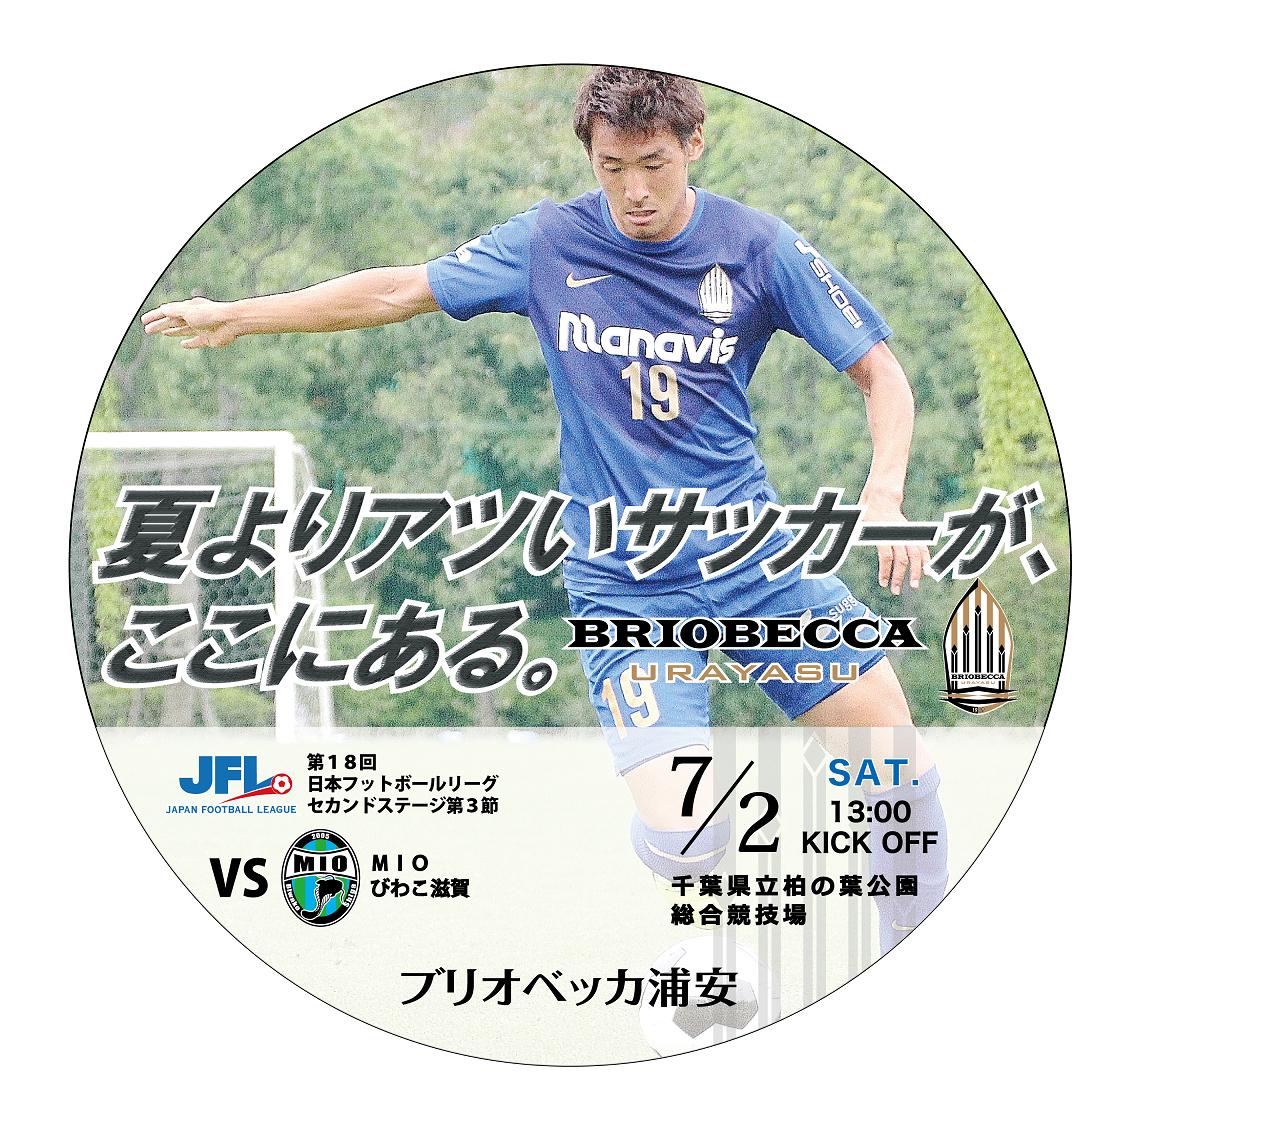 7/02(土)第18回 JFL 2nd-S 第3節 MIOびわこ滋賀戦について